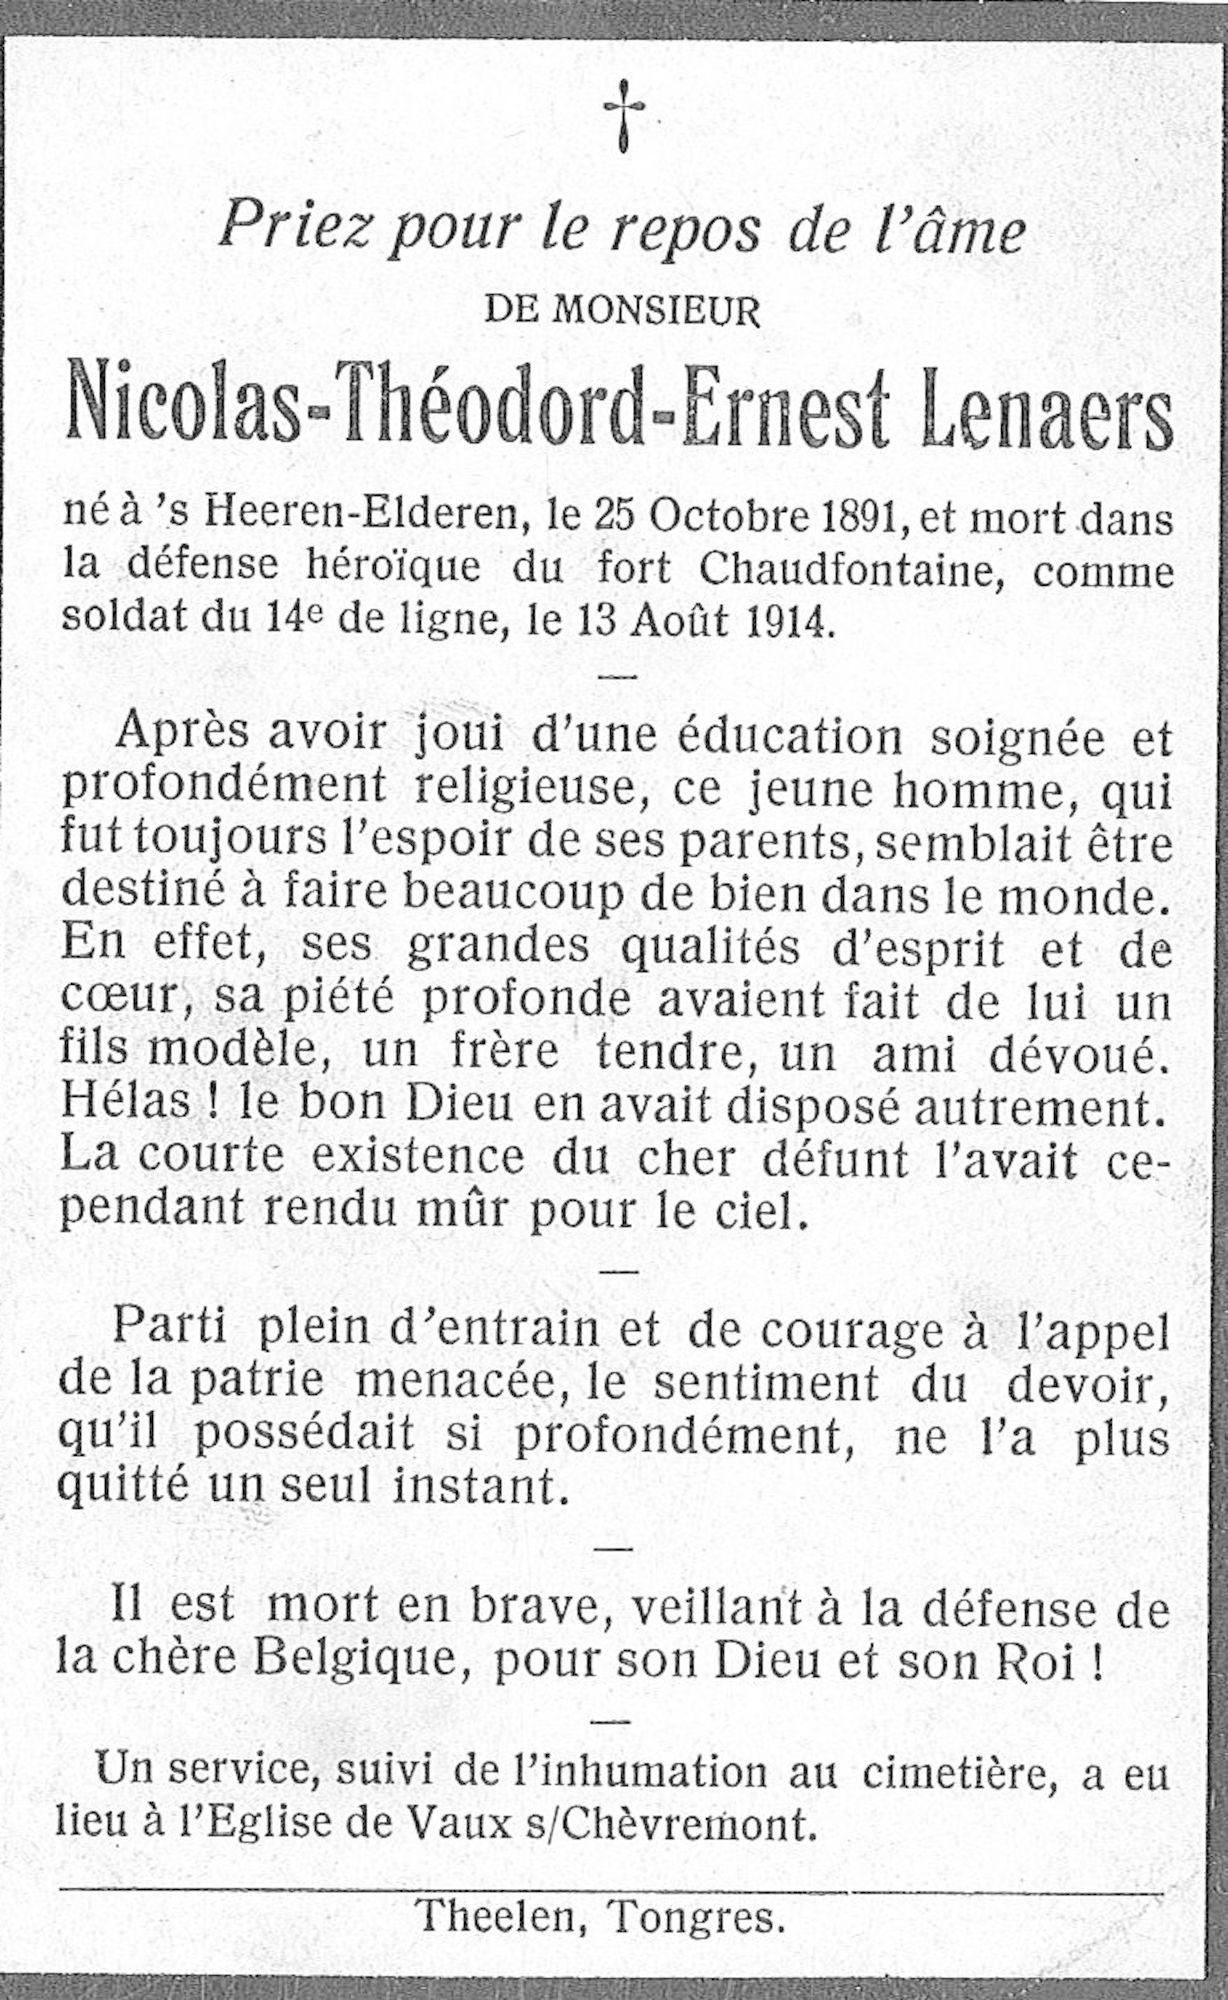 Nicolas-Théodord-Ernest Lenaers